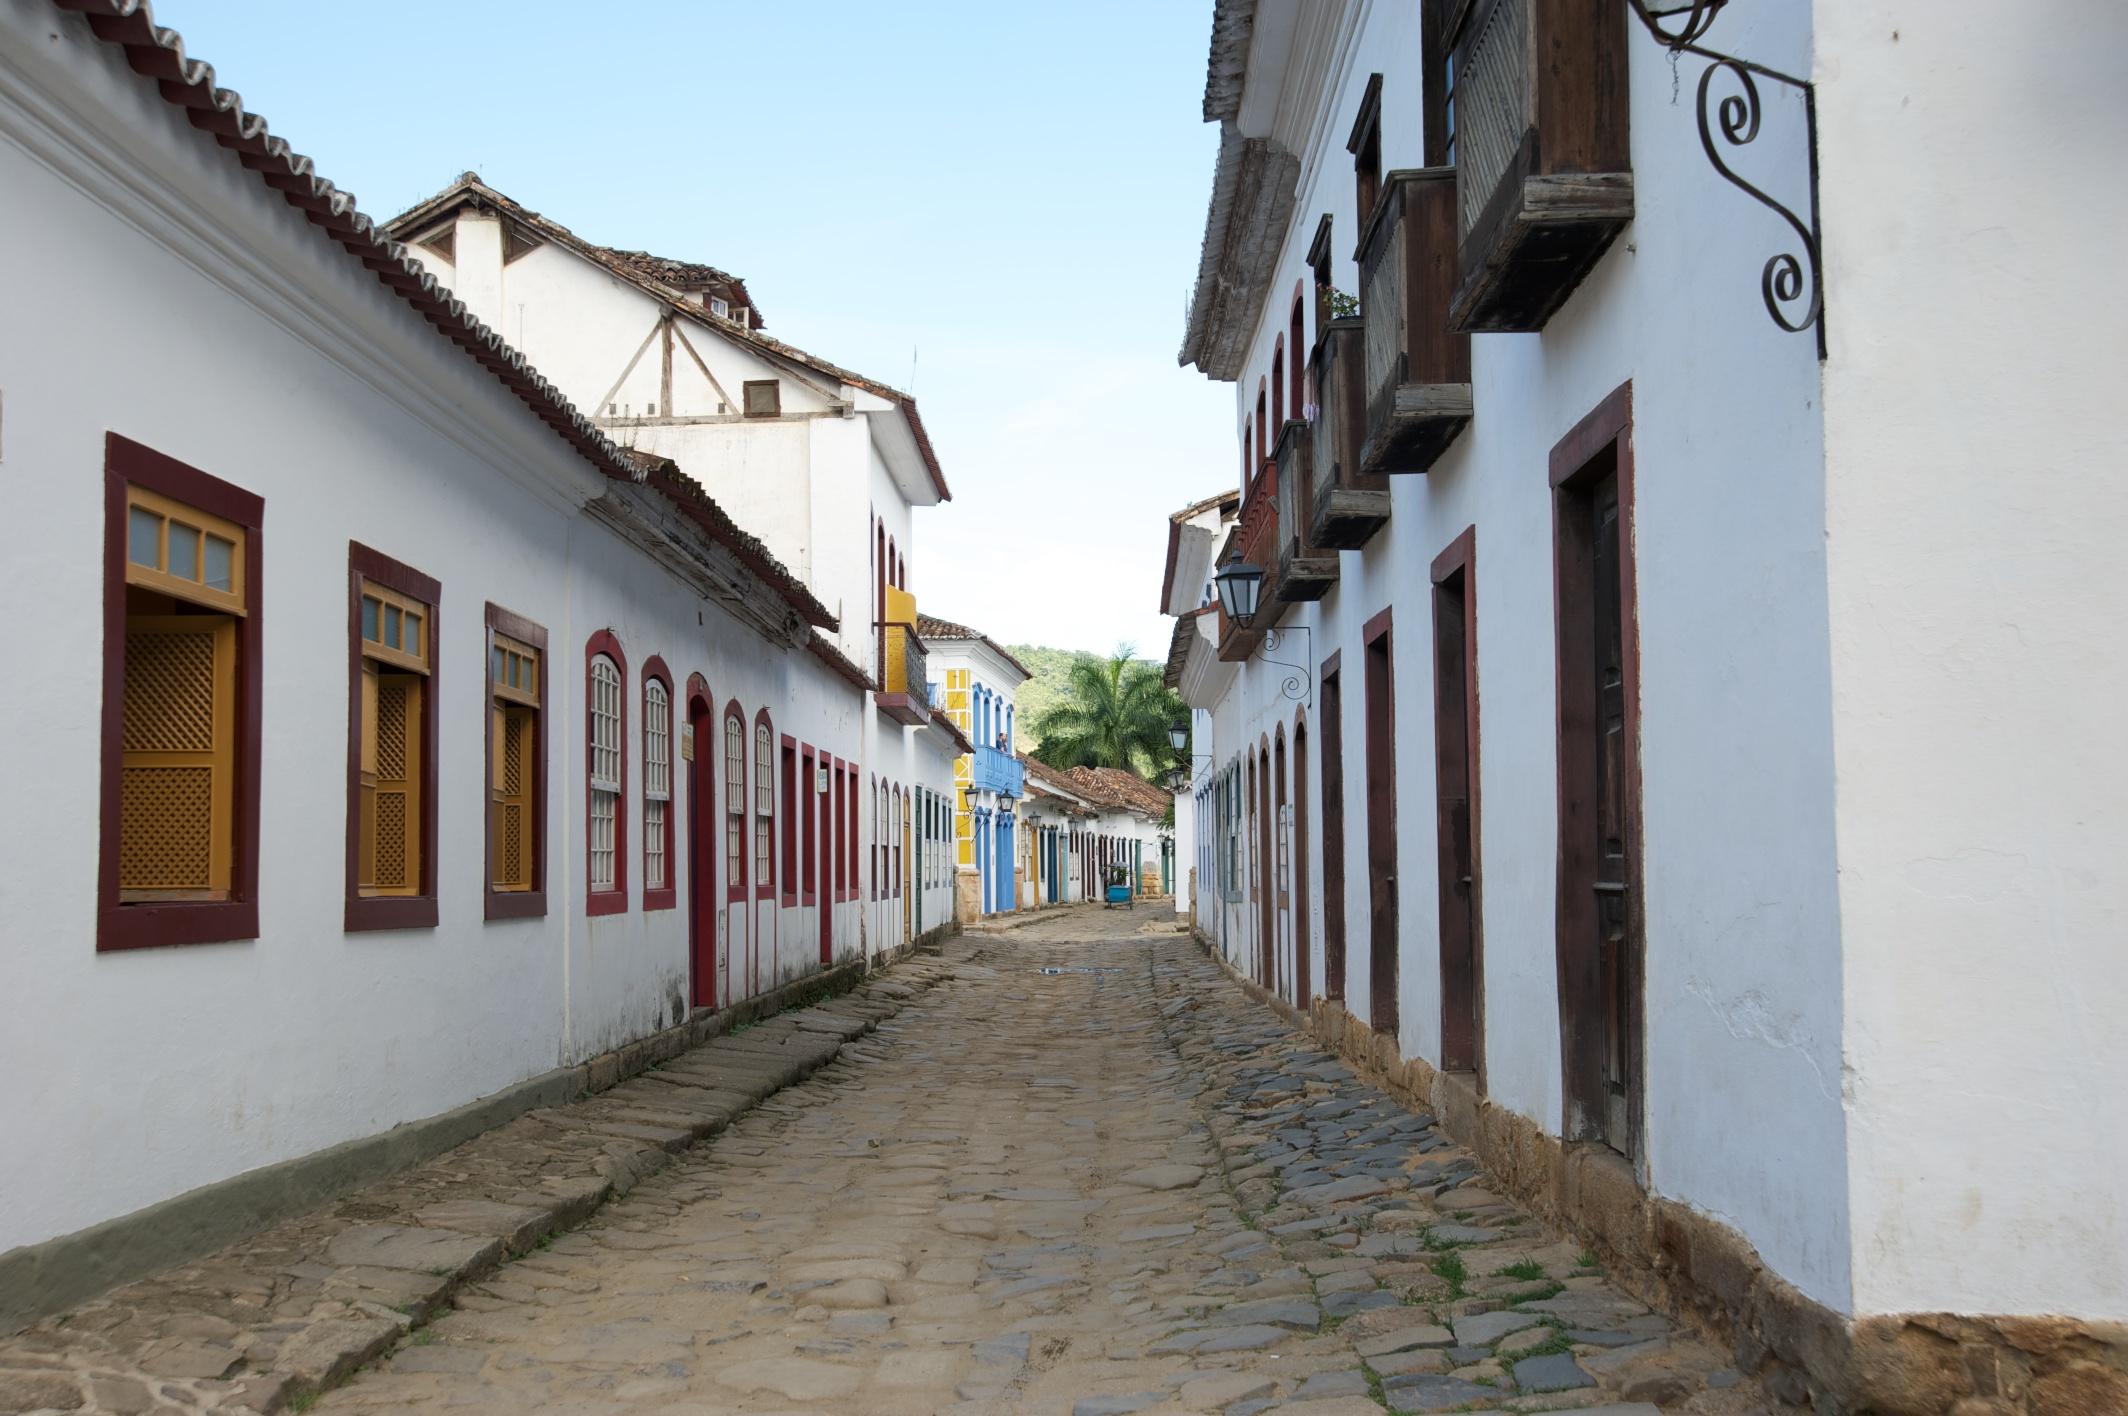 Street scene #7, Paraty, Costa Verde, Brazil, 12 Apr 2012